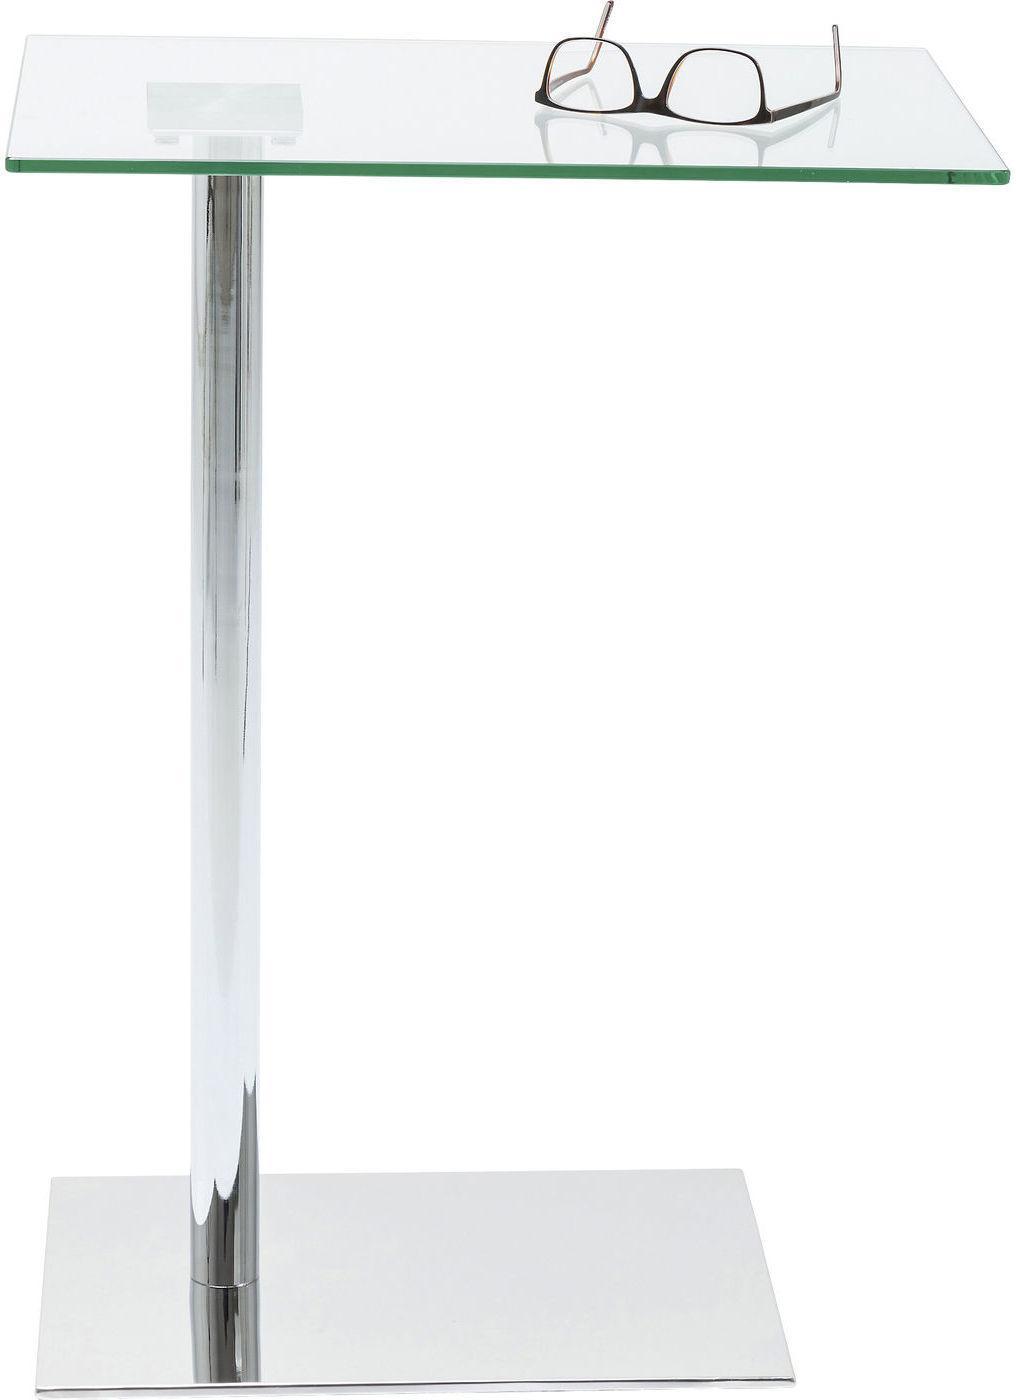 Design Bijzettafel Chroomglas.Bijzettafel West Coast Chroom 67x34x50 Kare Design Lil Nl